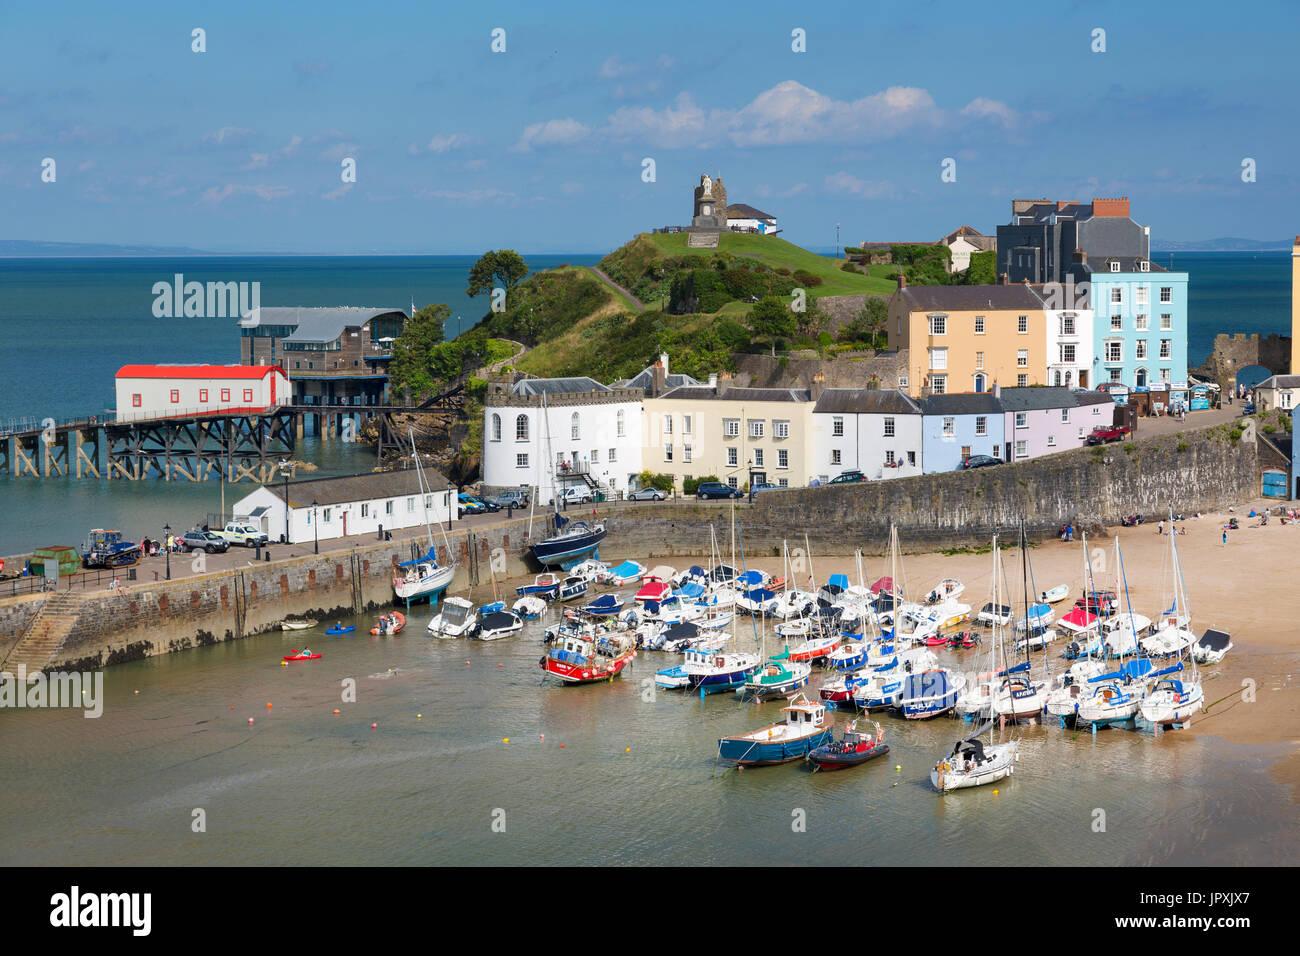 Tenby Harbour,  Carmarthenshire, Wales, UK - Stock Image